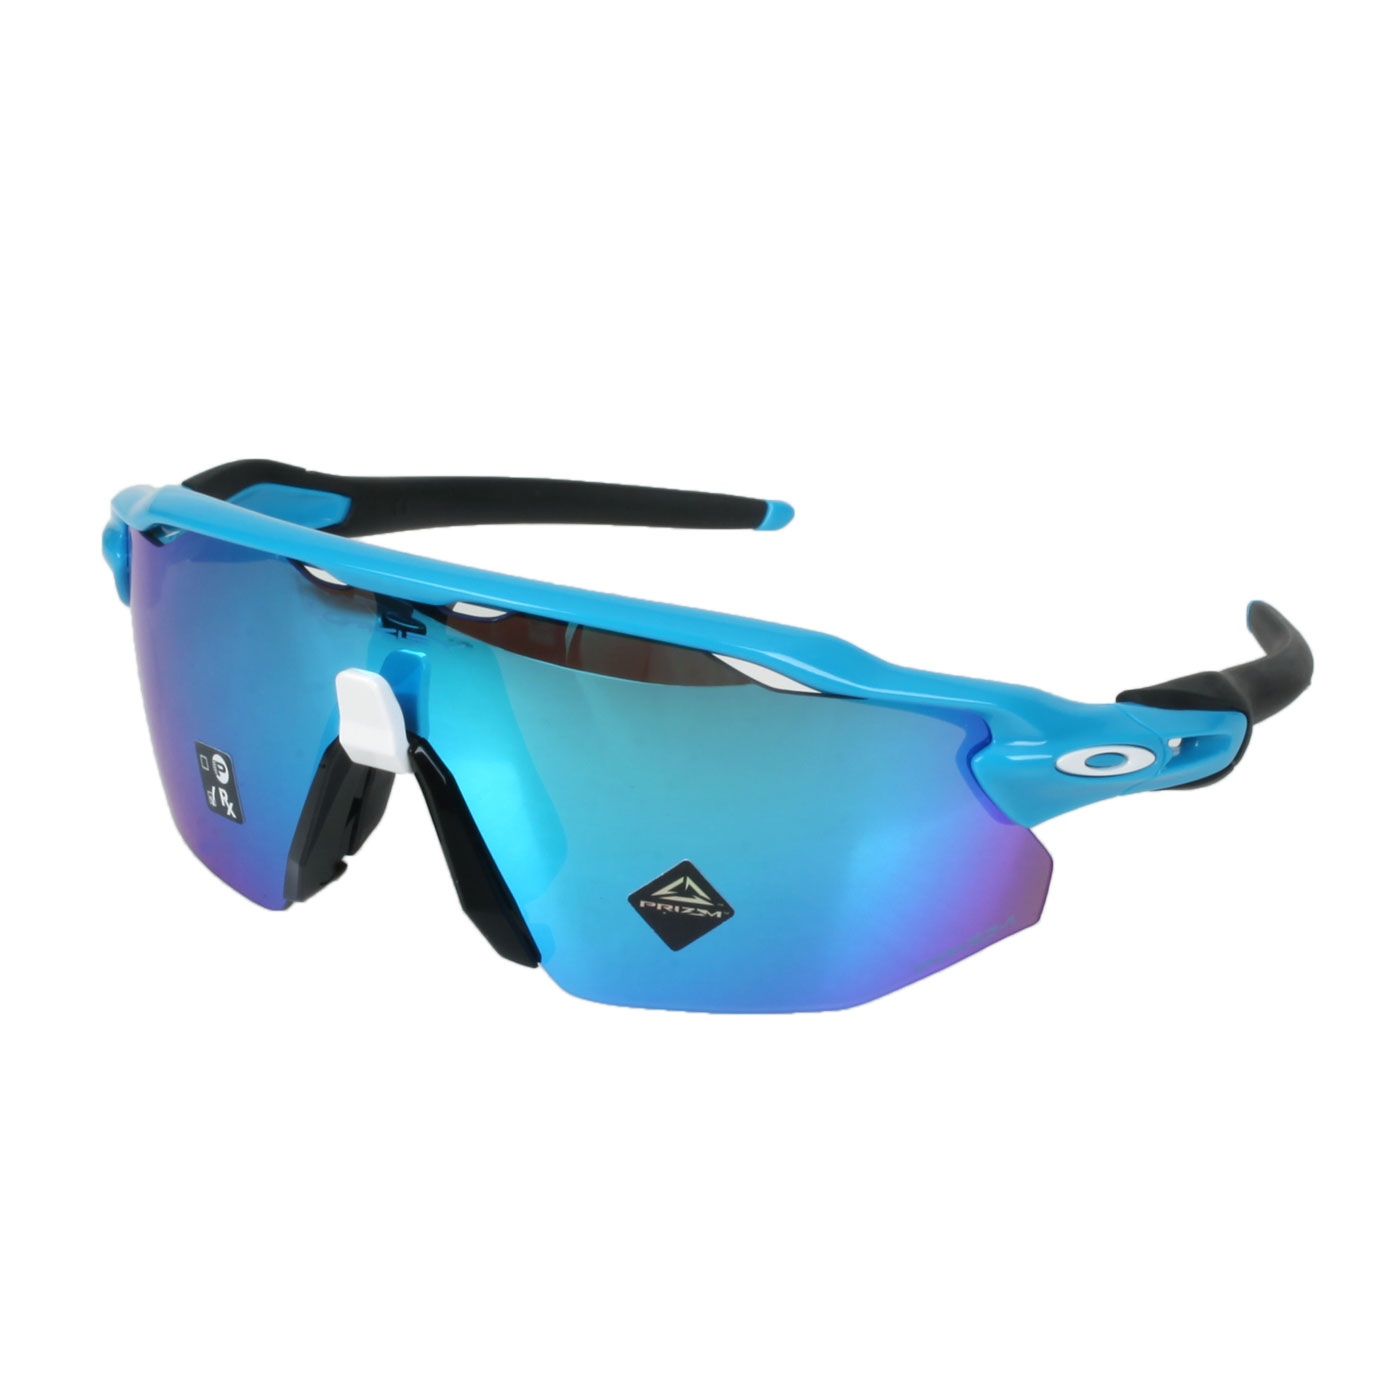 OAKLEY RADAR EV ADVANCER一般太陽眼鏡(附硬盒鼻墊) OAK-OO9442-0238 - 寶藍黑